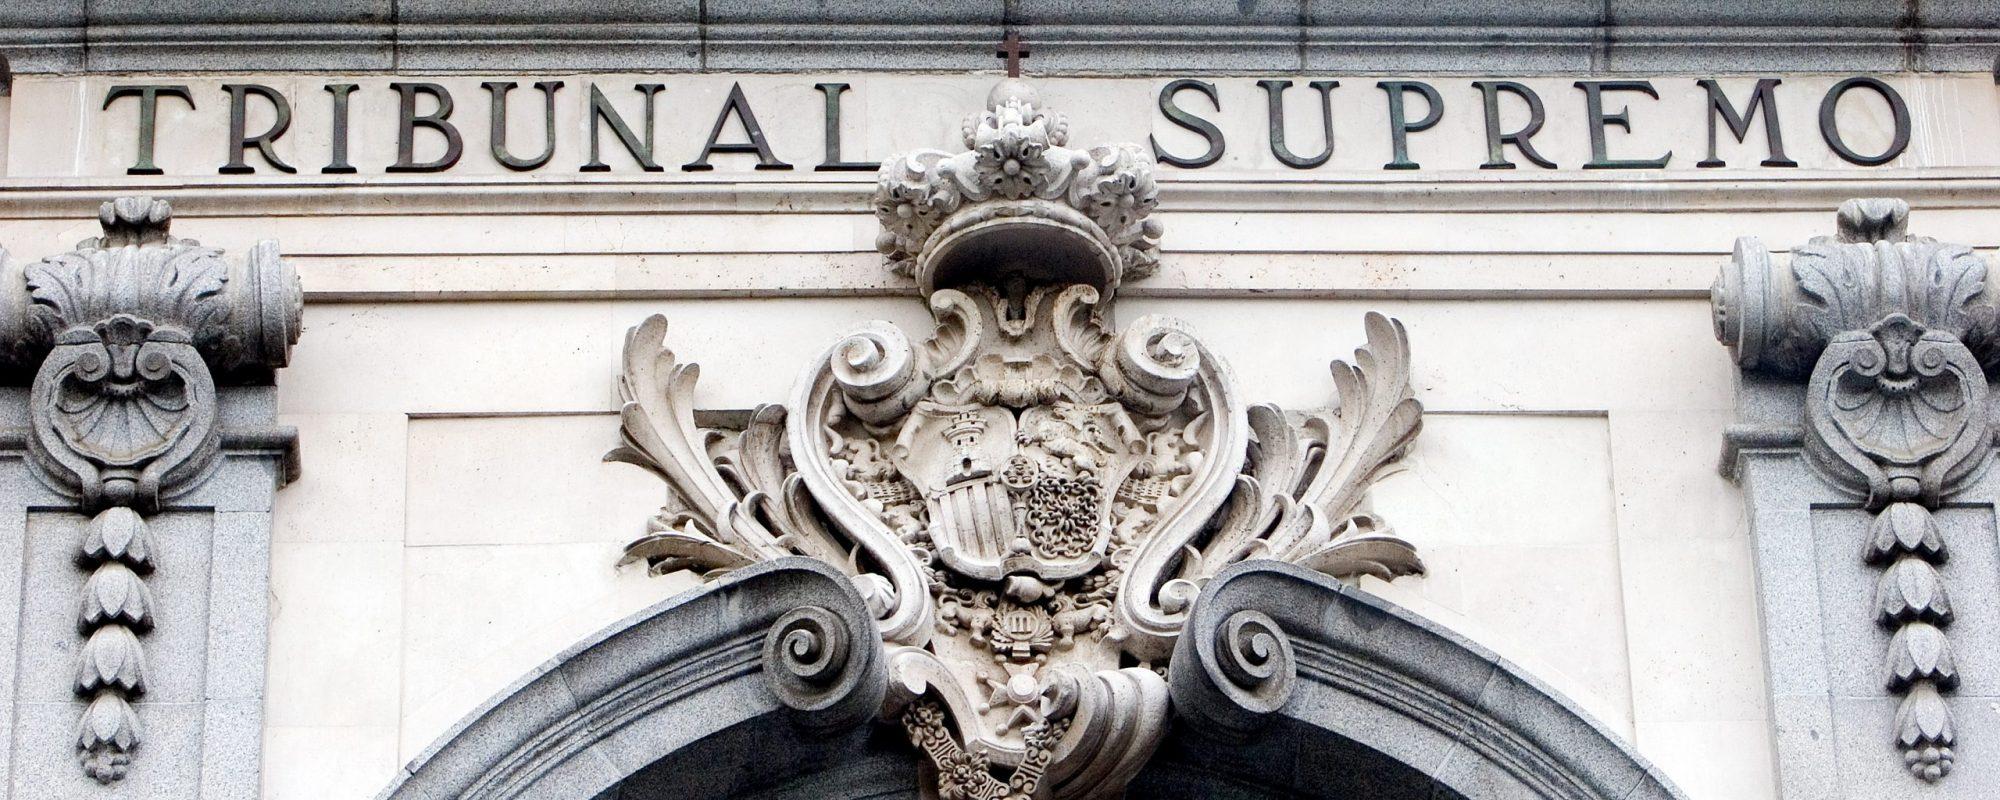 Tribunal Supremo. Madrid, 02-10-05